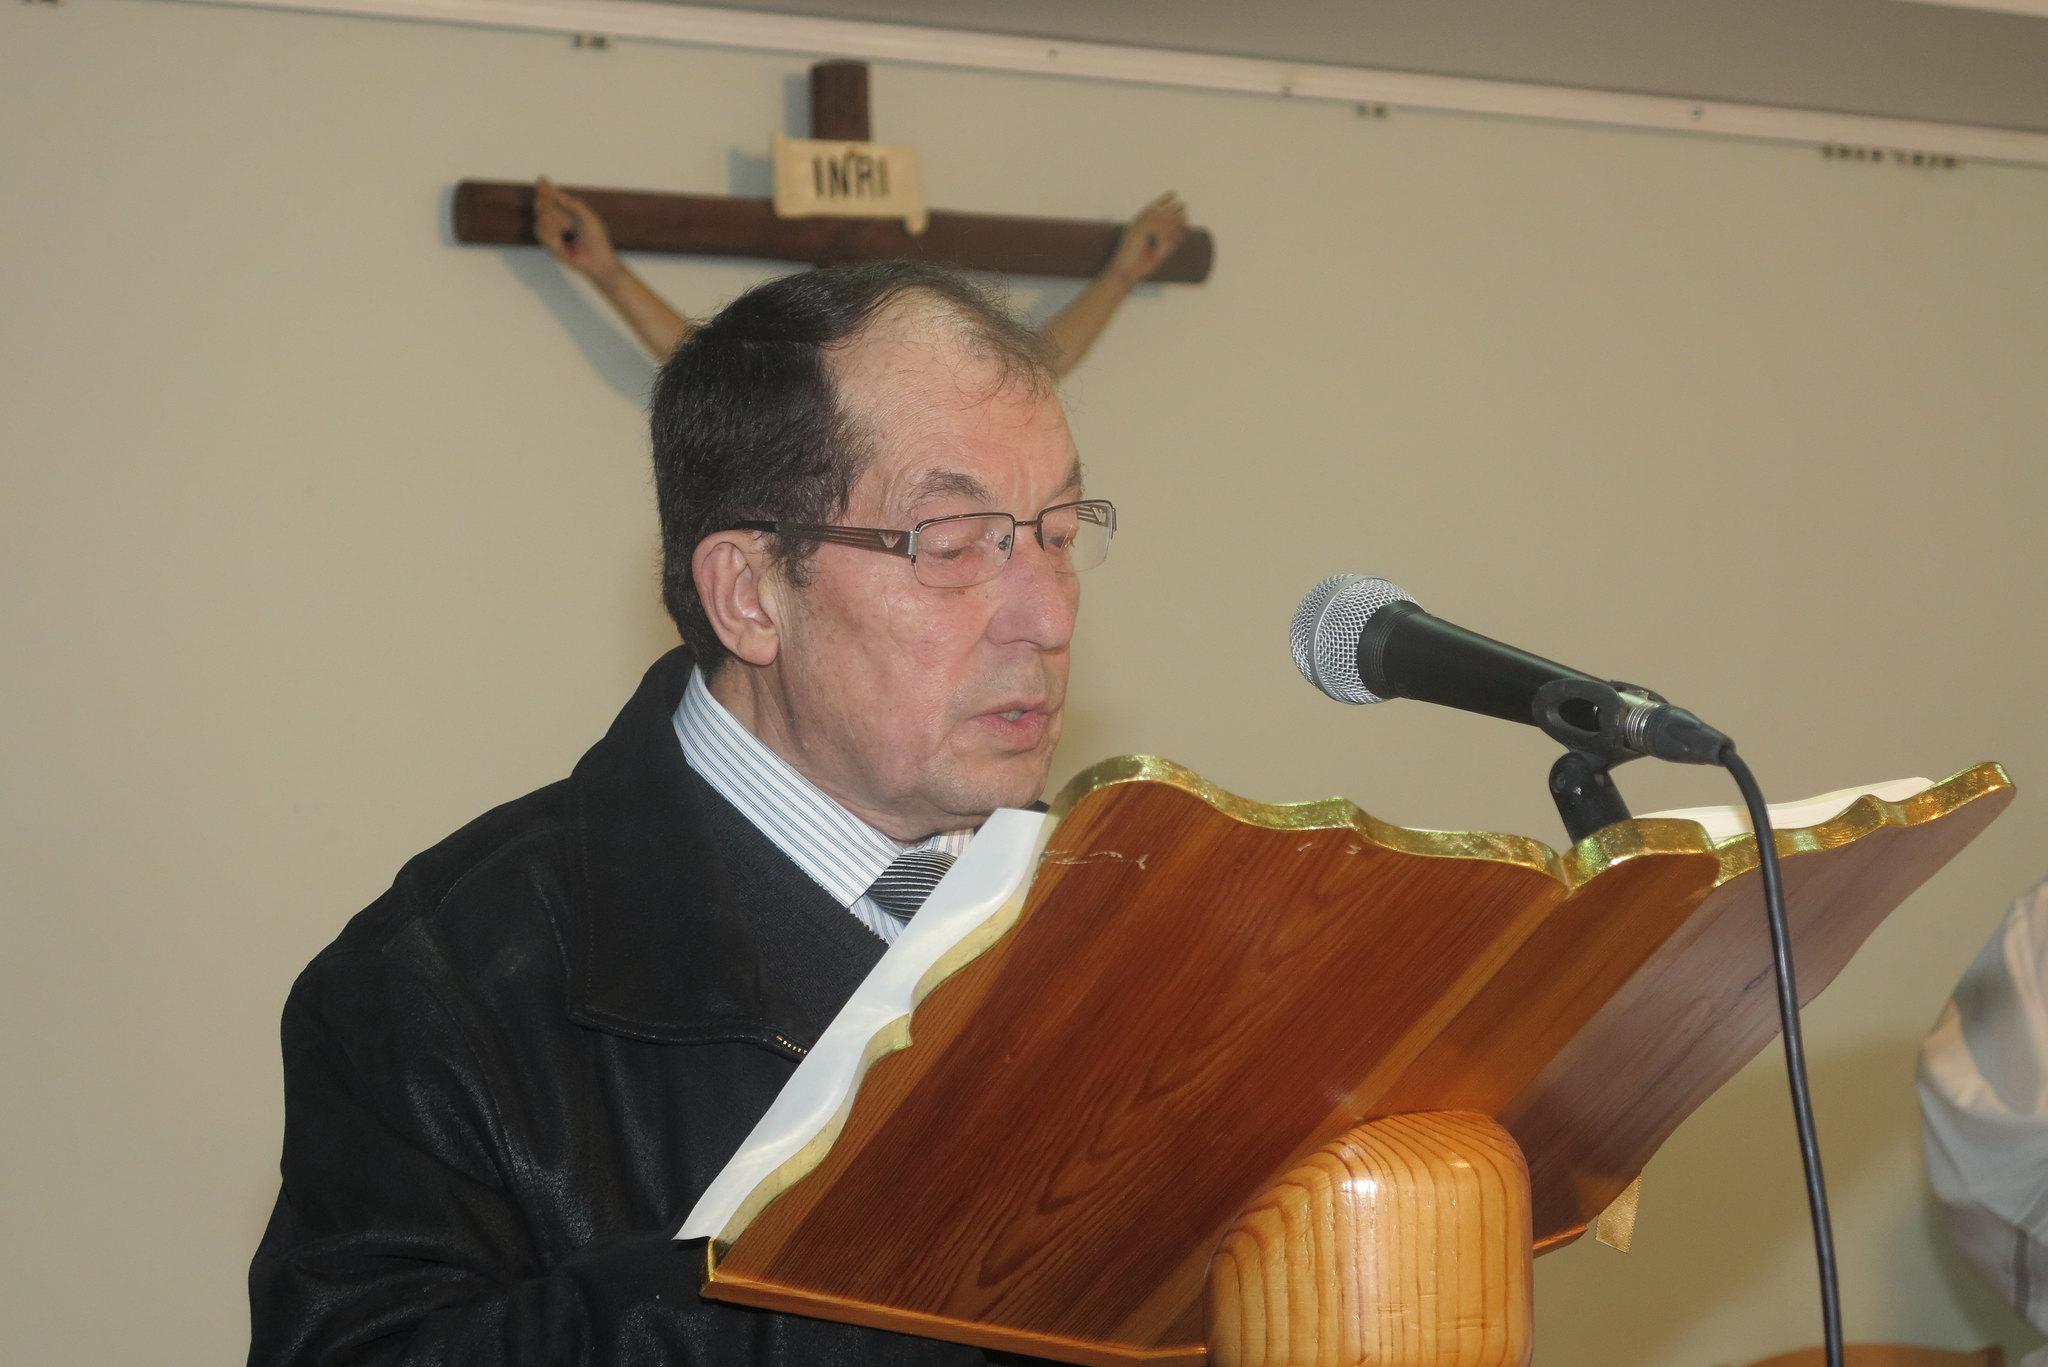 (2016-02-13) - Inauguración Virgen de Lourdes, La Molineta - Archivo La Molineta 2 (37)